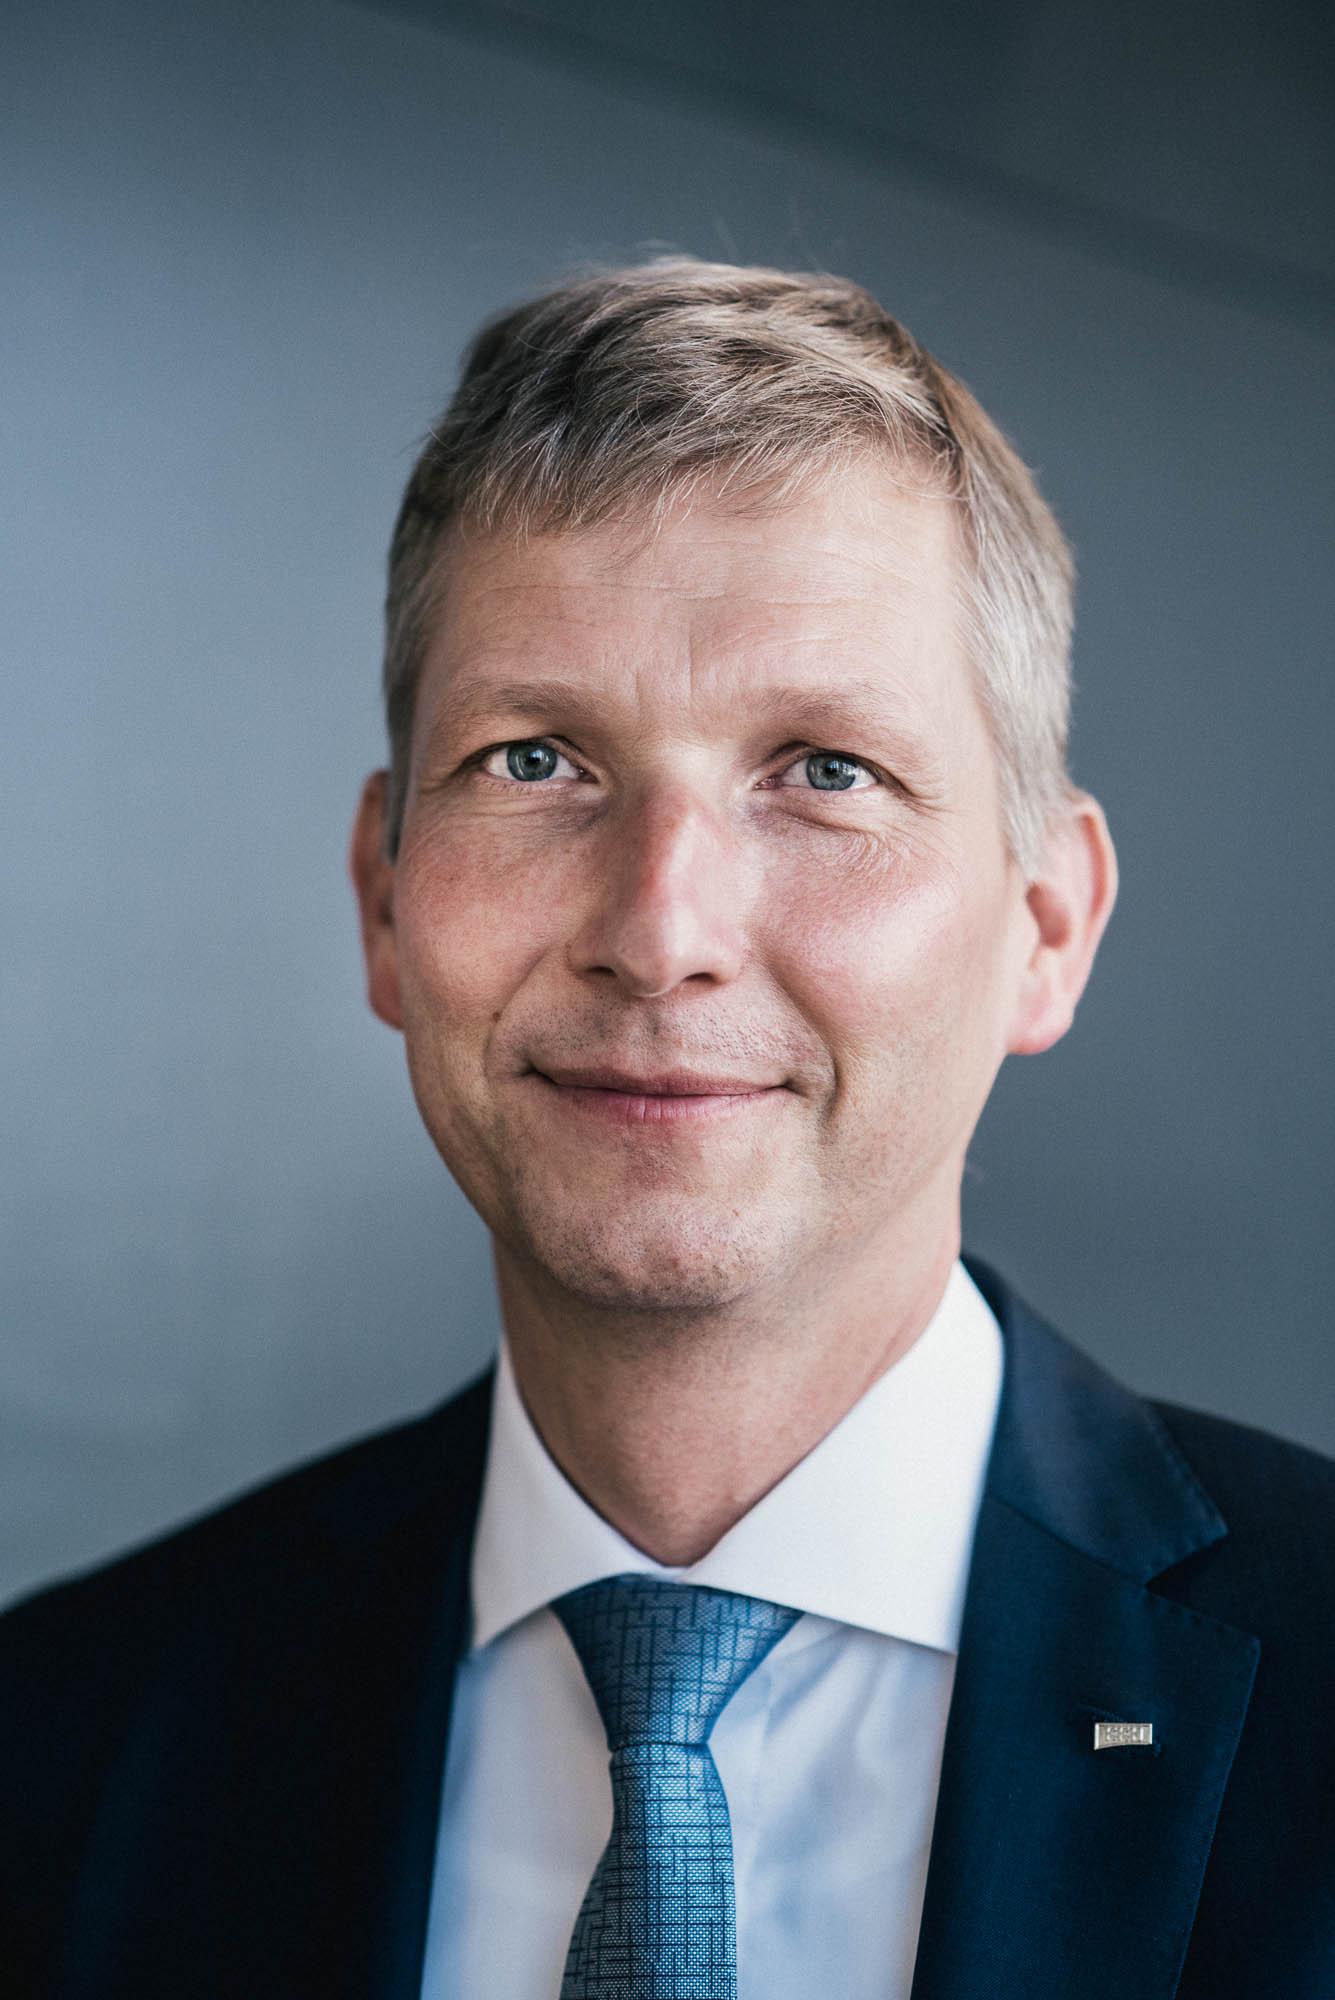 Moritz Küstner Portrait